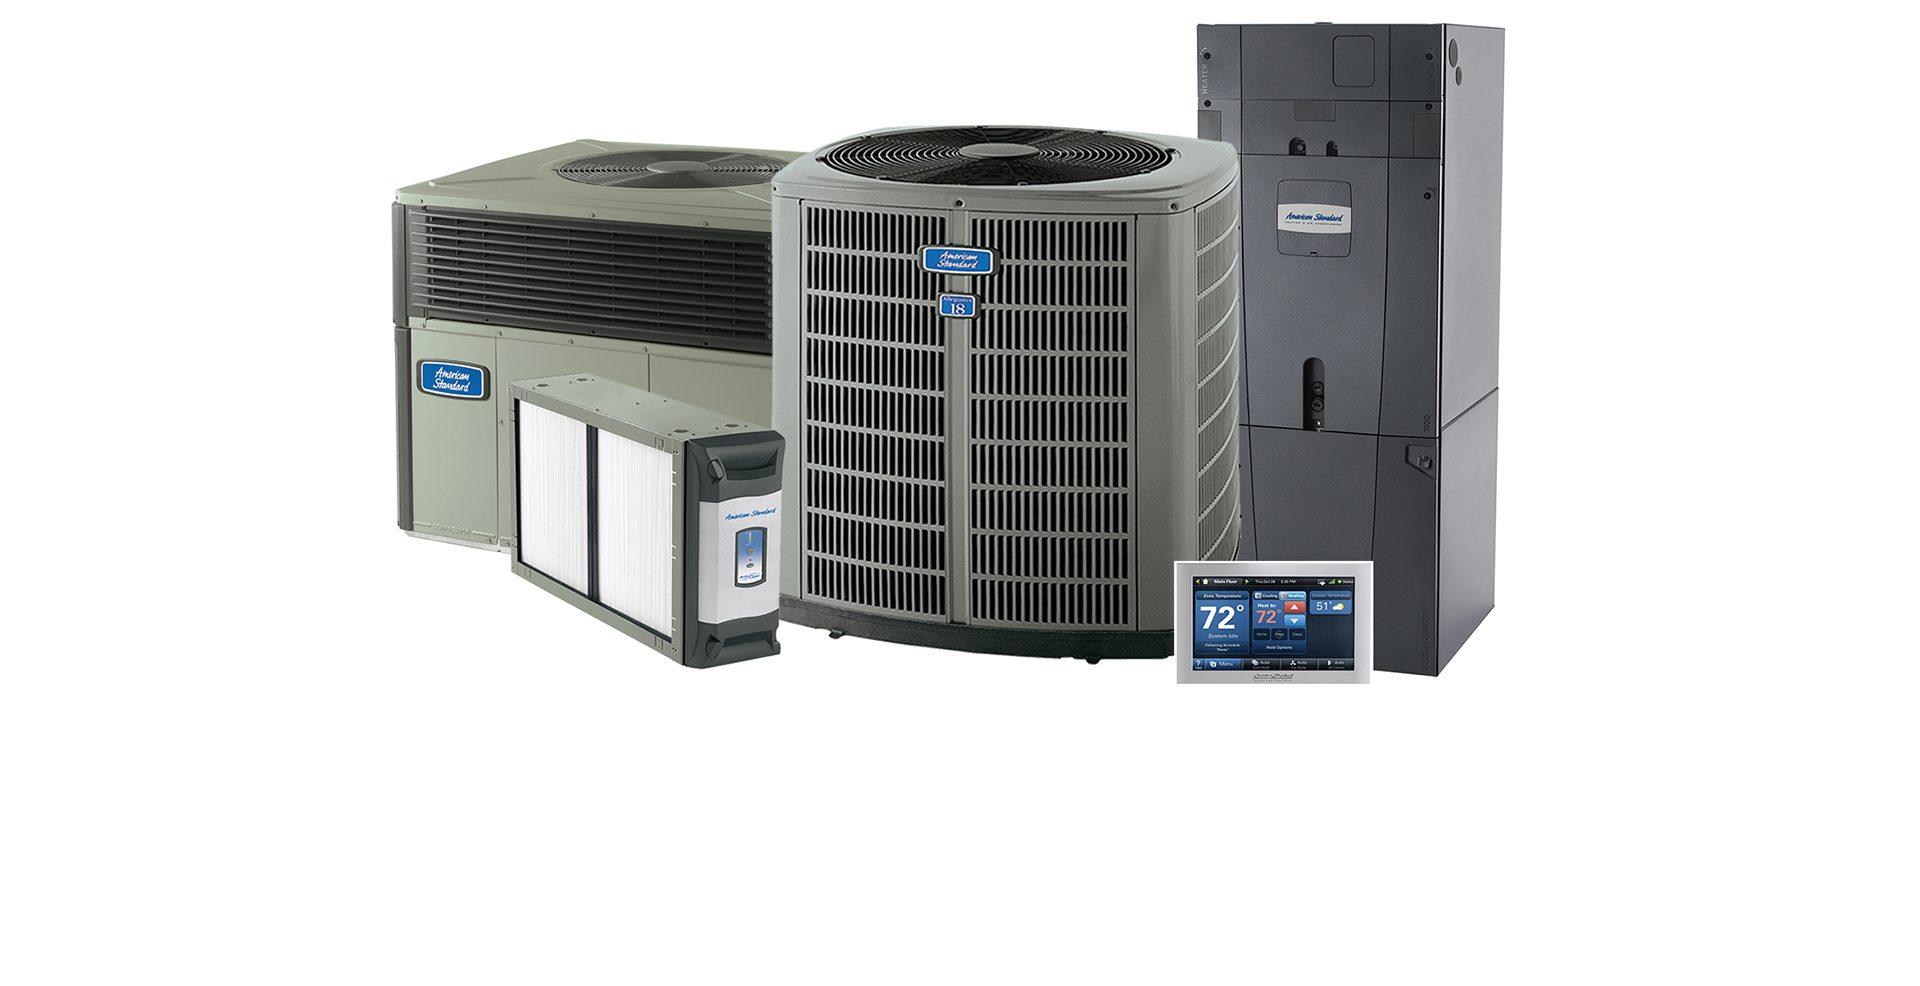 American Standard brand of air conditioning equipment dealer, HVAC Equipment family photo